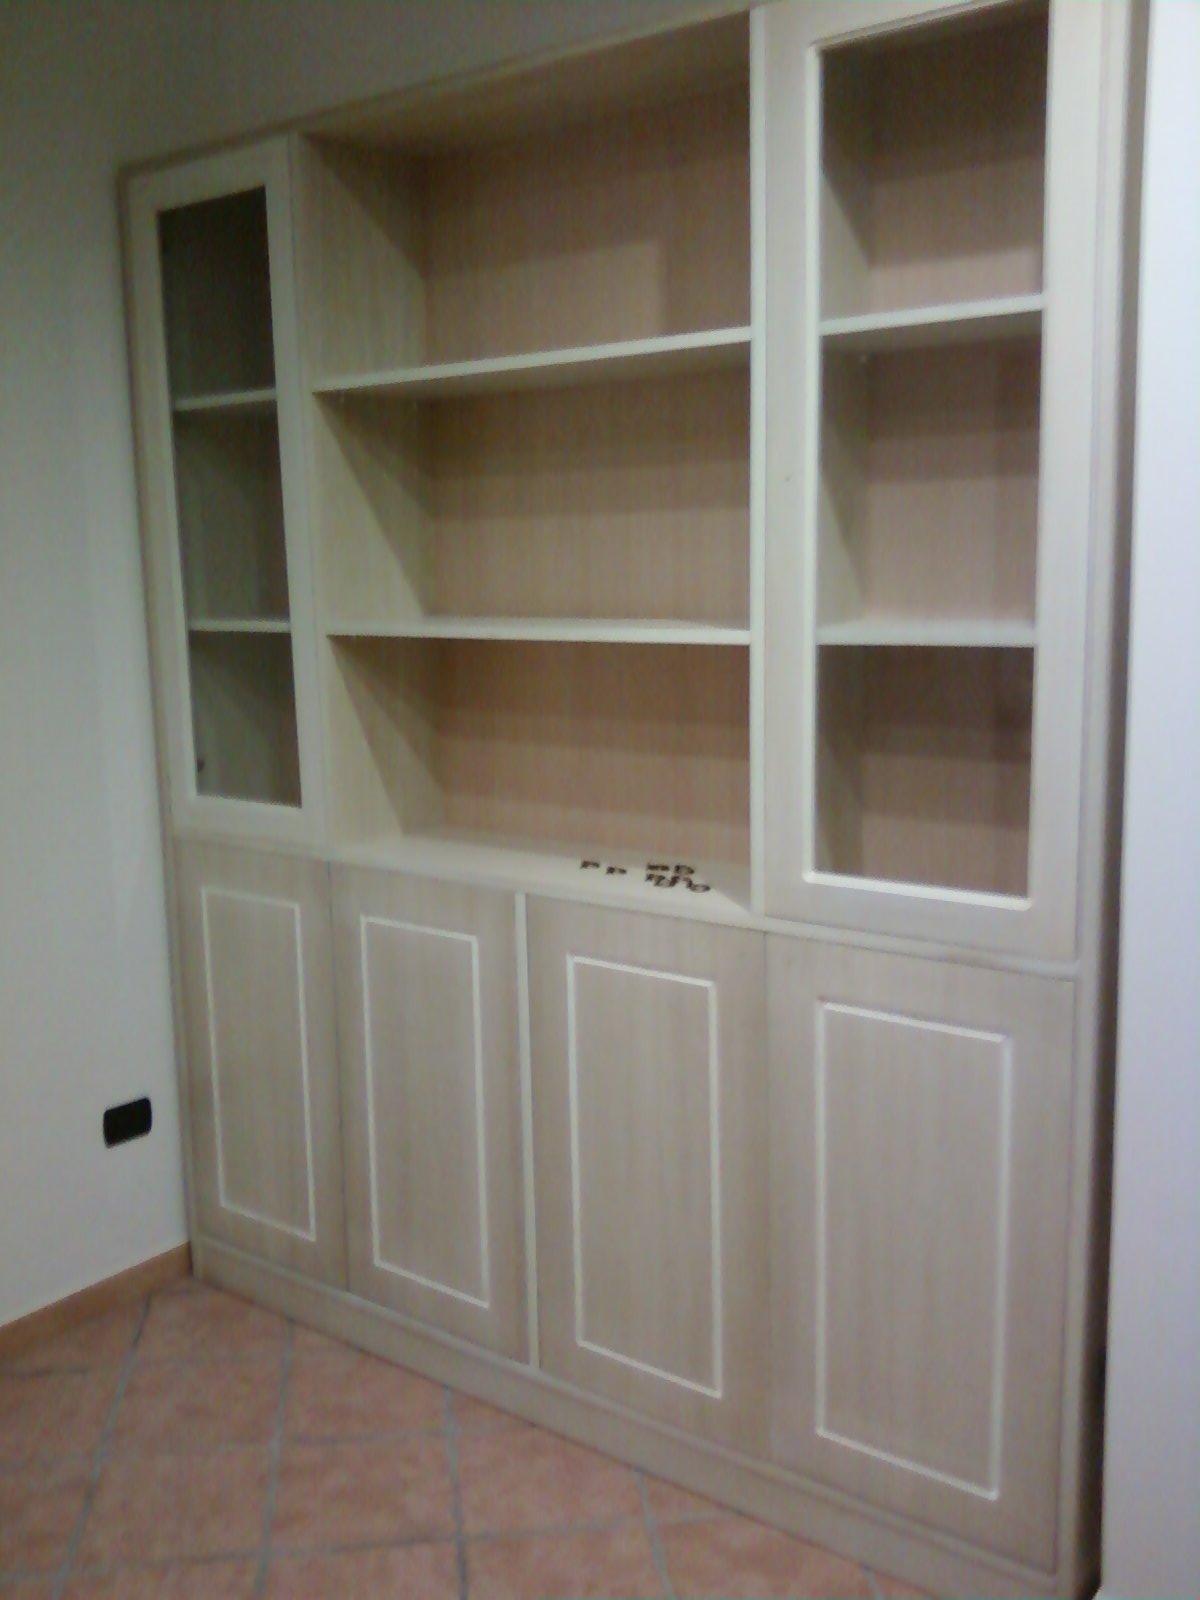 Libreria Scorrevole Fai Da Te fai da te hobby legno: libreria incassata